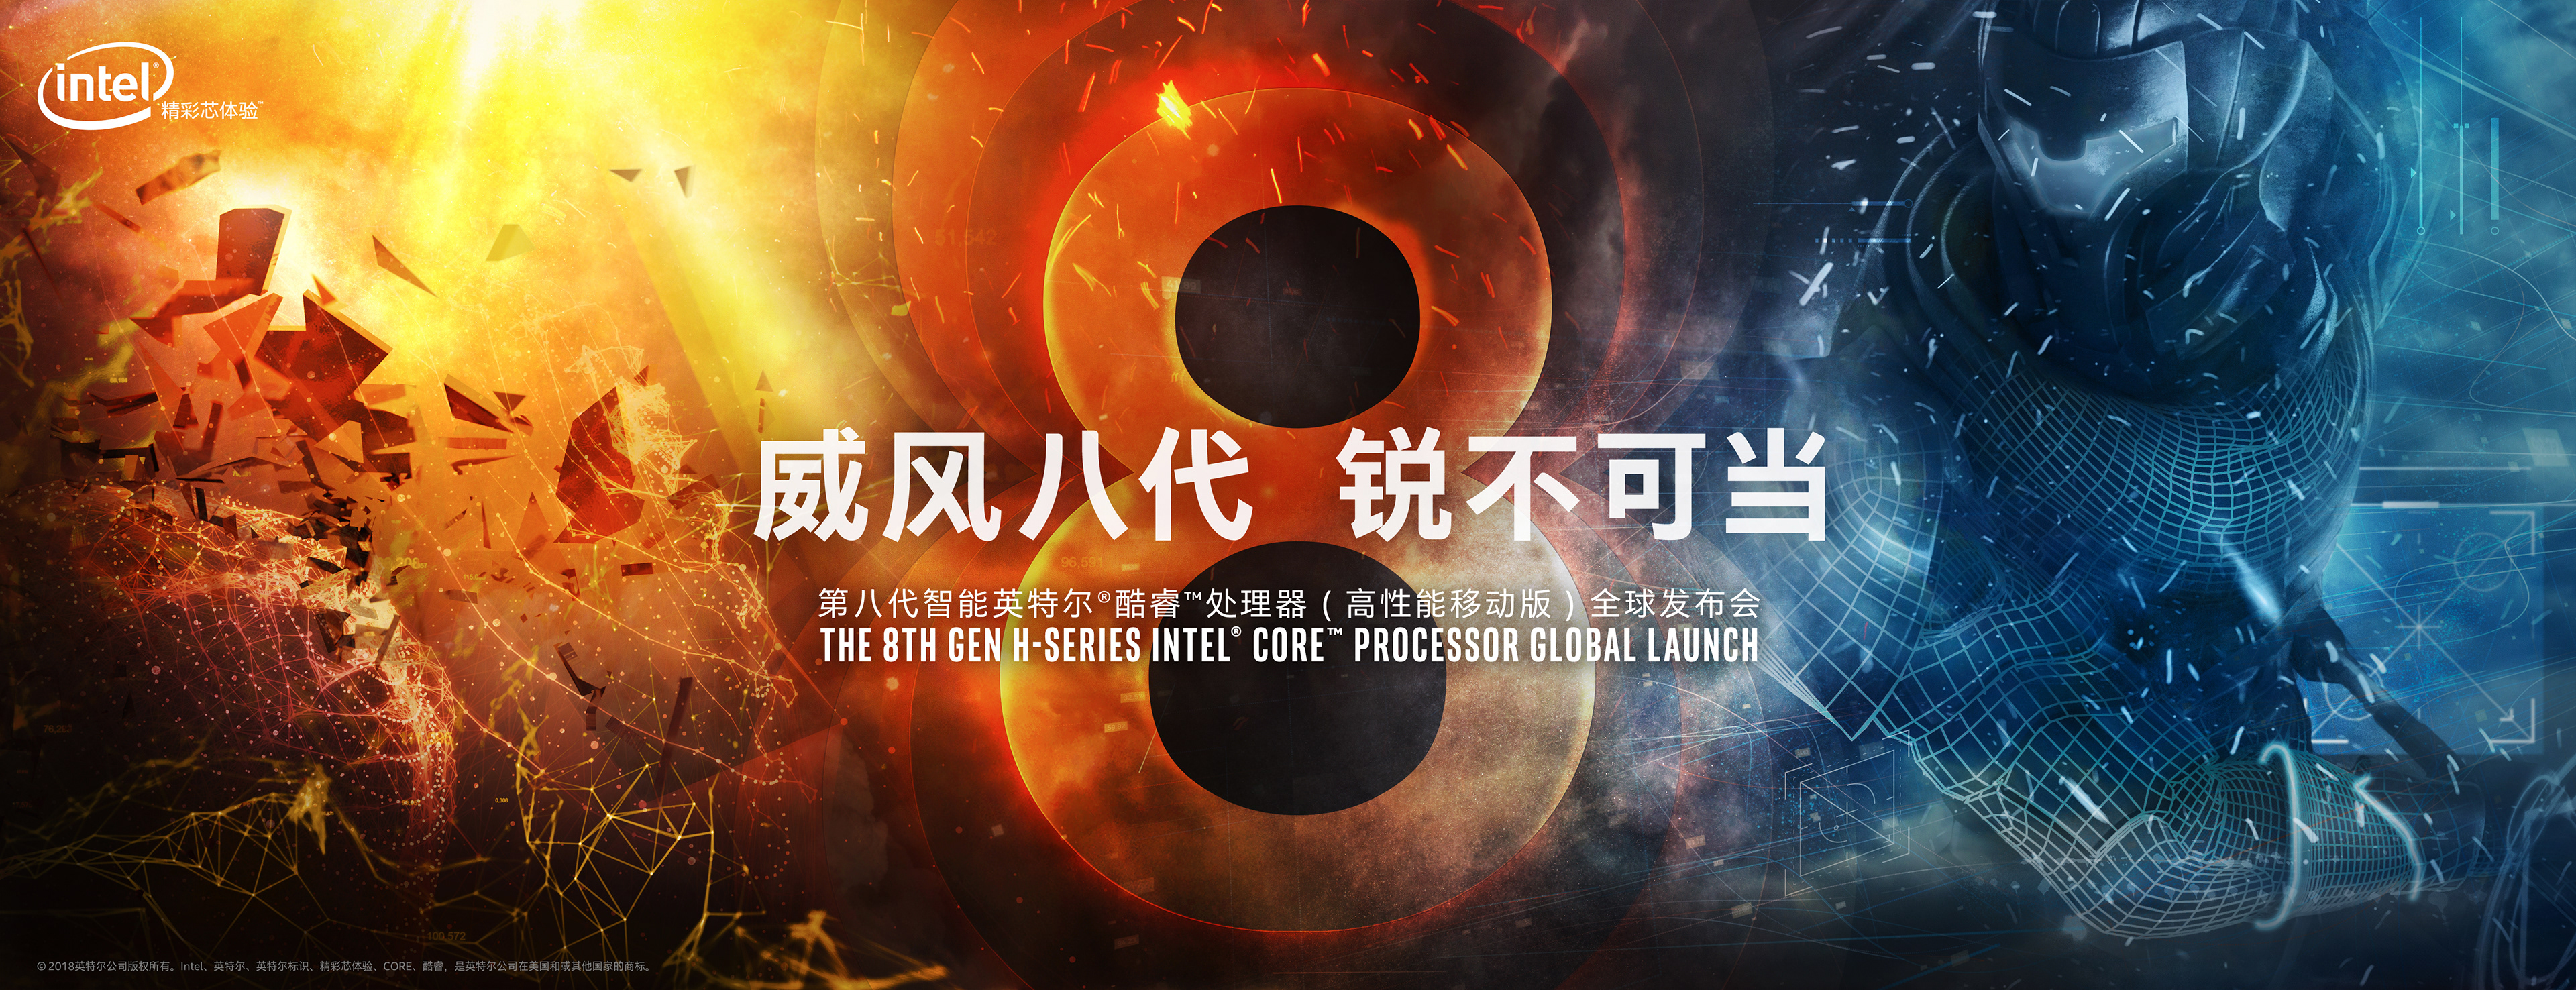 Quoc Lu Intel Infinite Power Of 8